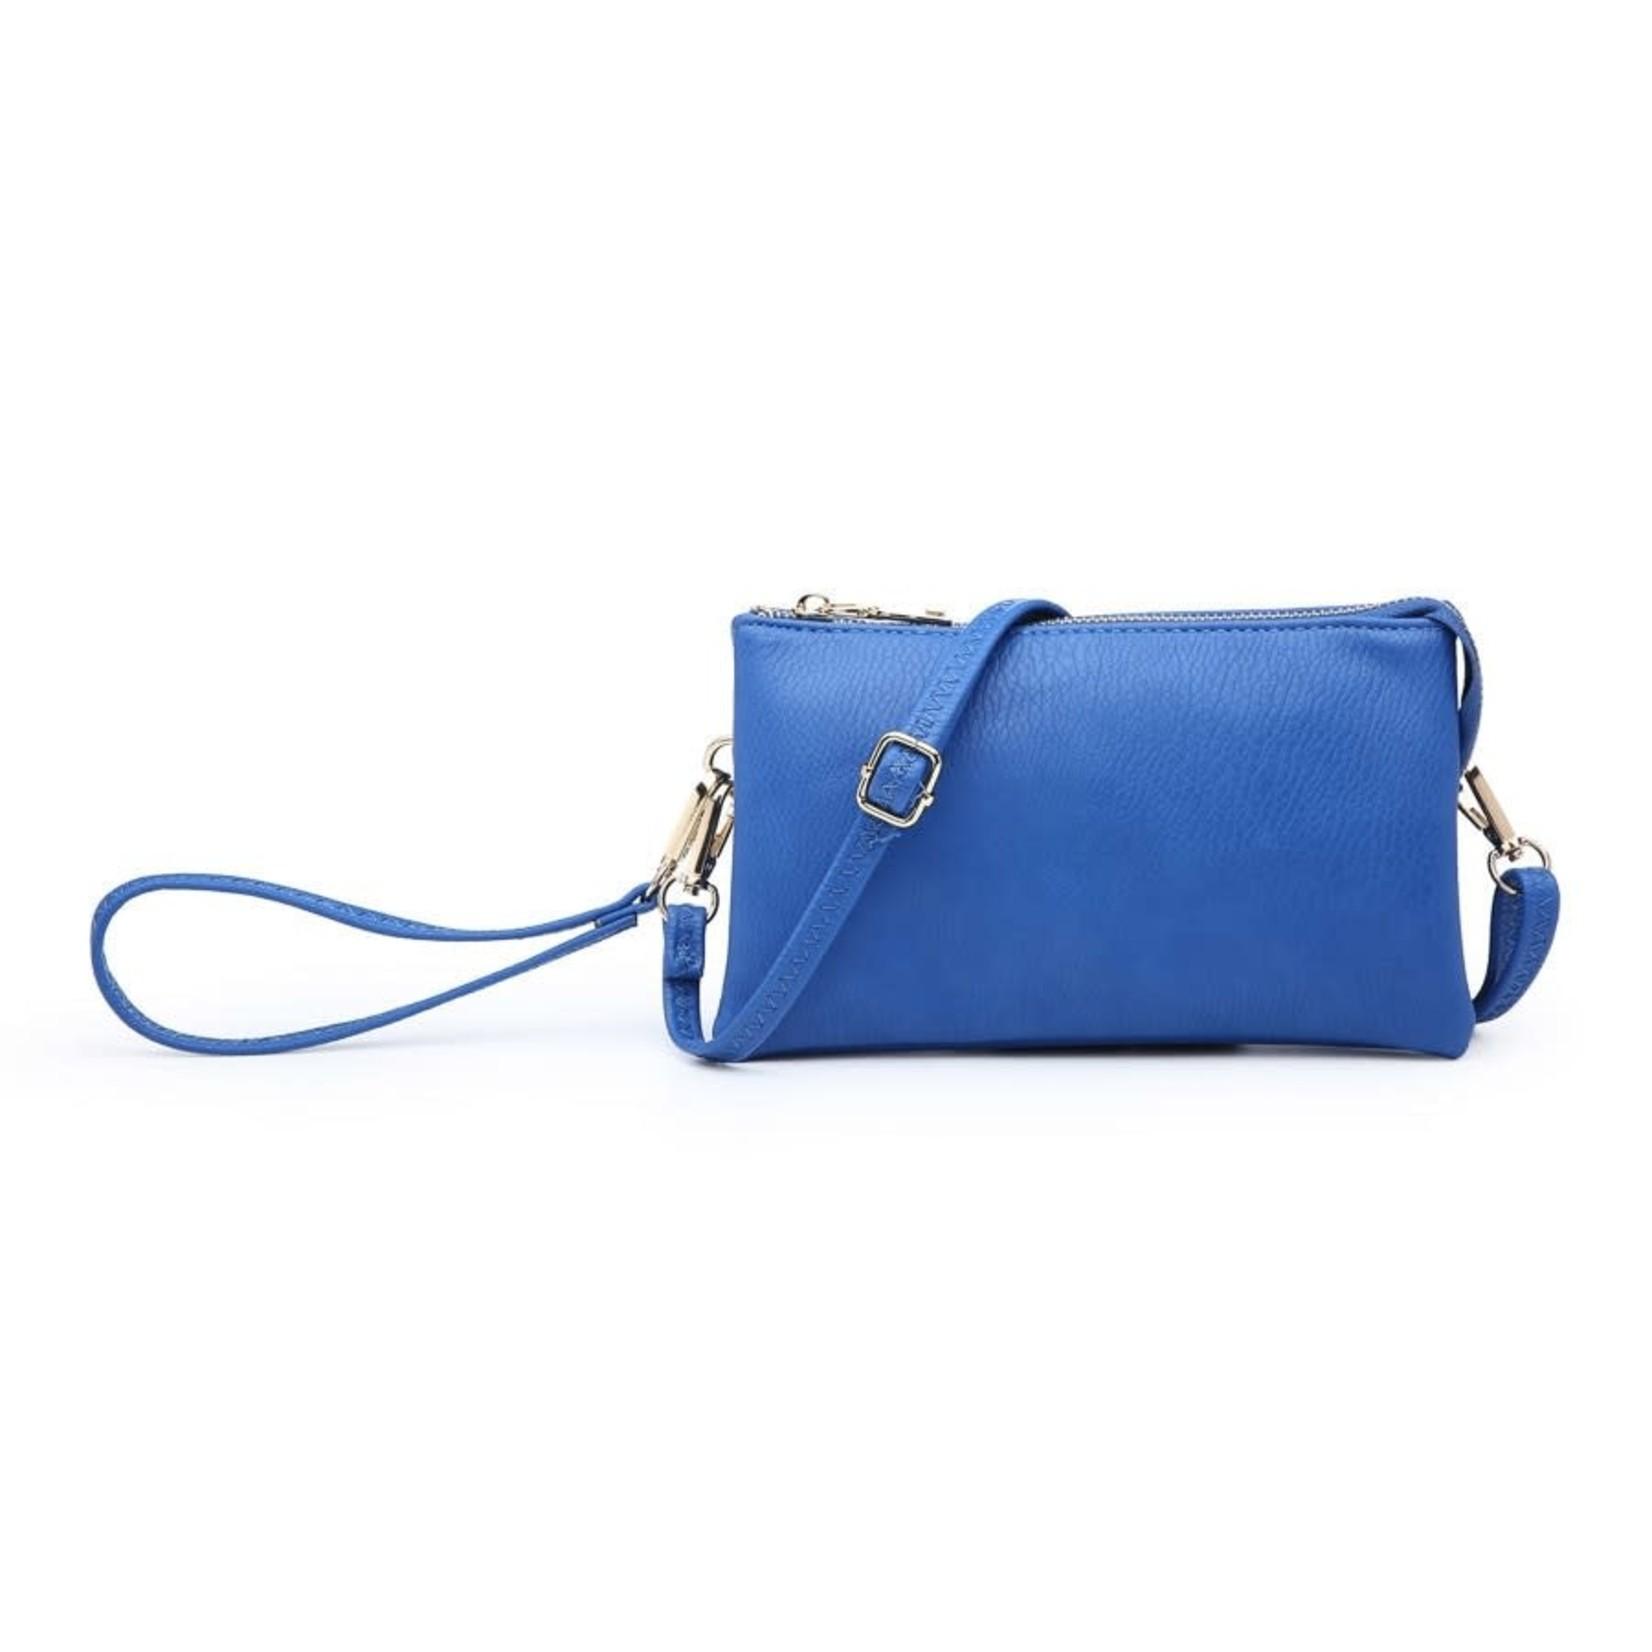 Riley - Vegan Leather Double-Sided Wristlet/Crossbody - Royal Blue (RYB)